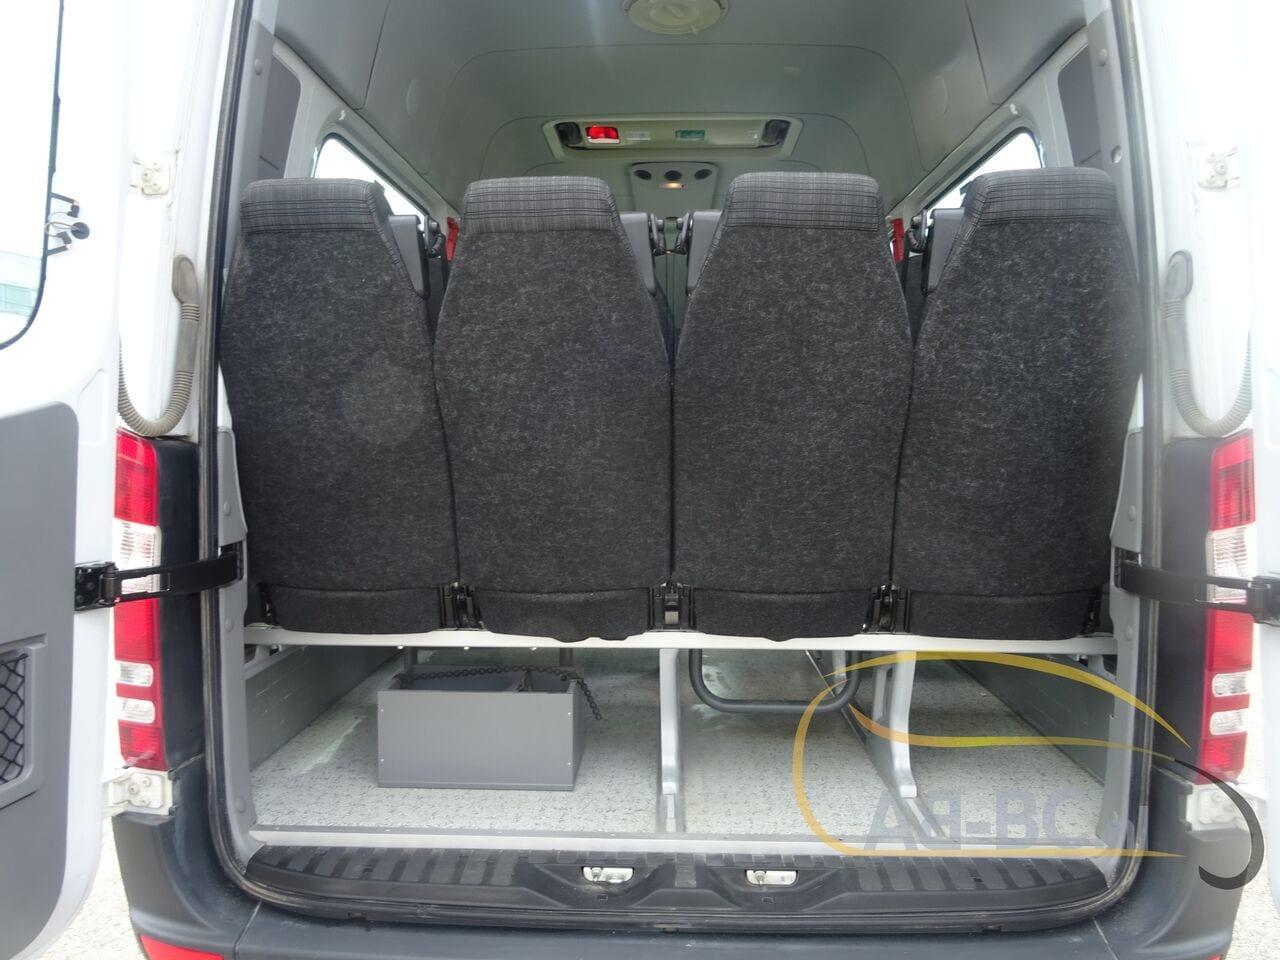 coach-busMERCEDES-BENZ-516-CDI-Sprinter-Transfer-45-23-Seats-EURO-6---1625234916443088859_big_197ab8aa3ea679811ad1b46f4d203c47--21060112394245379500